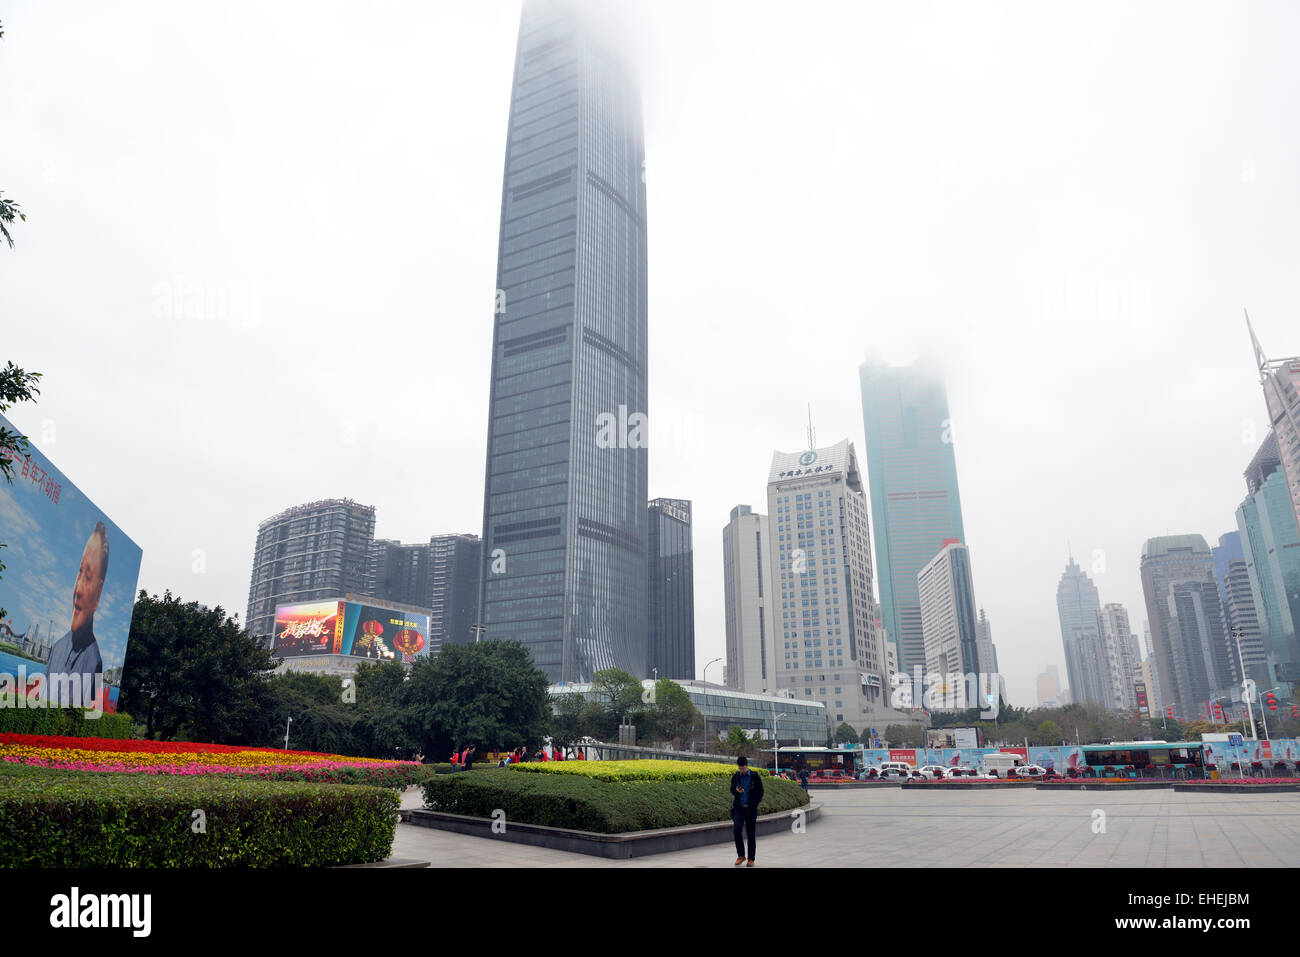 Skyscraper KK100 in Shenzhen, China. - Stock Image